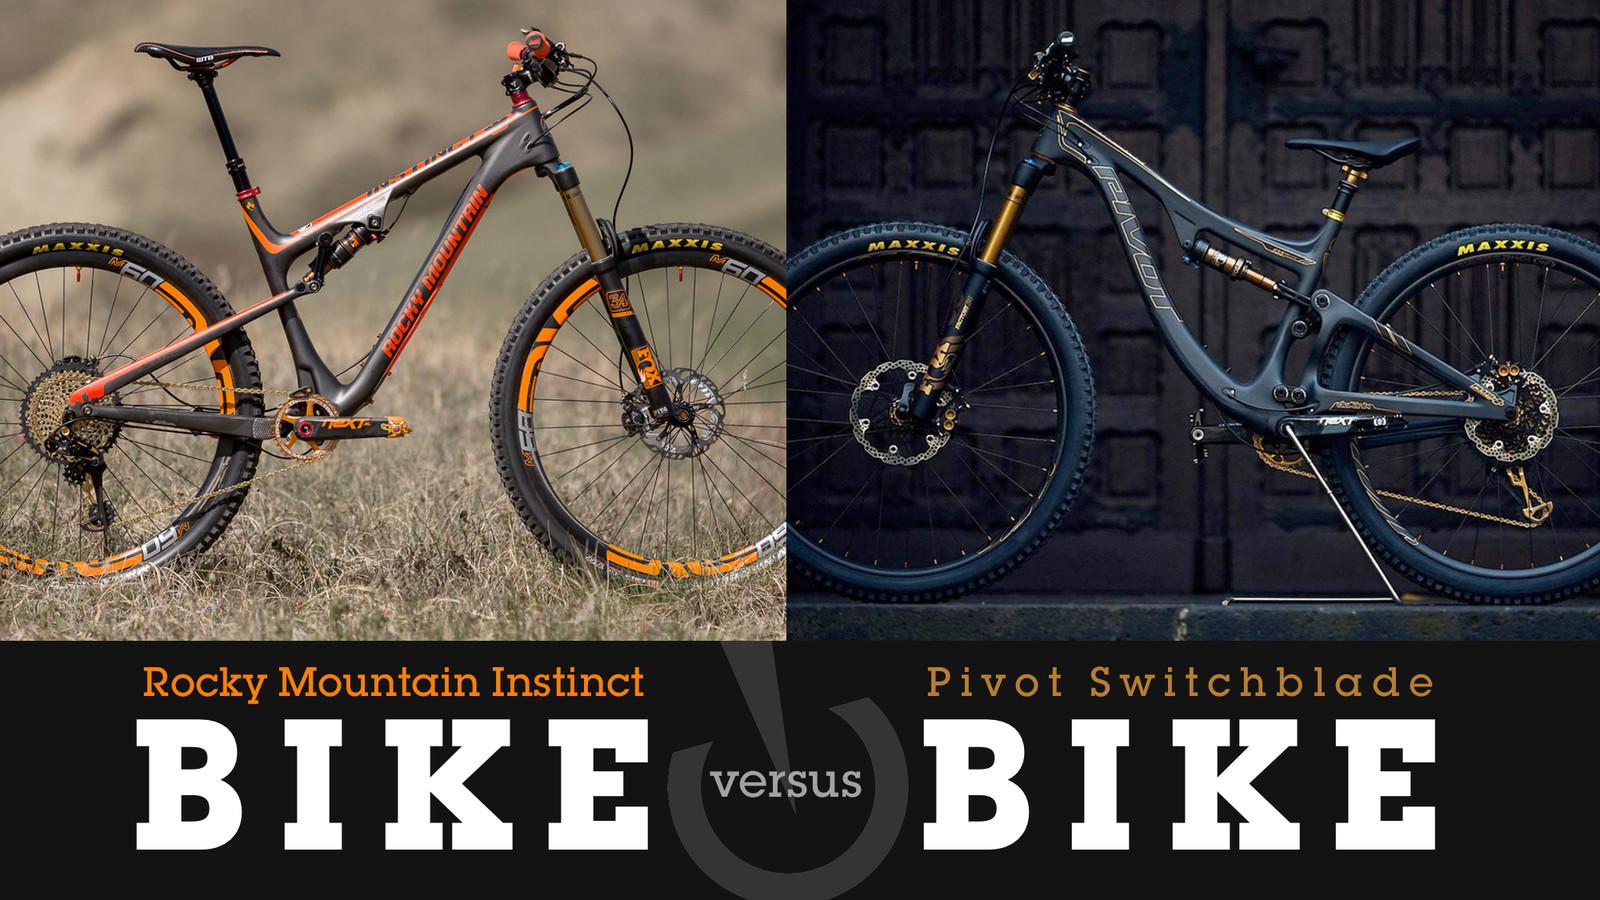 Bike vs  Bike - Rocky Mountain Instinct or Pivot Switchblade